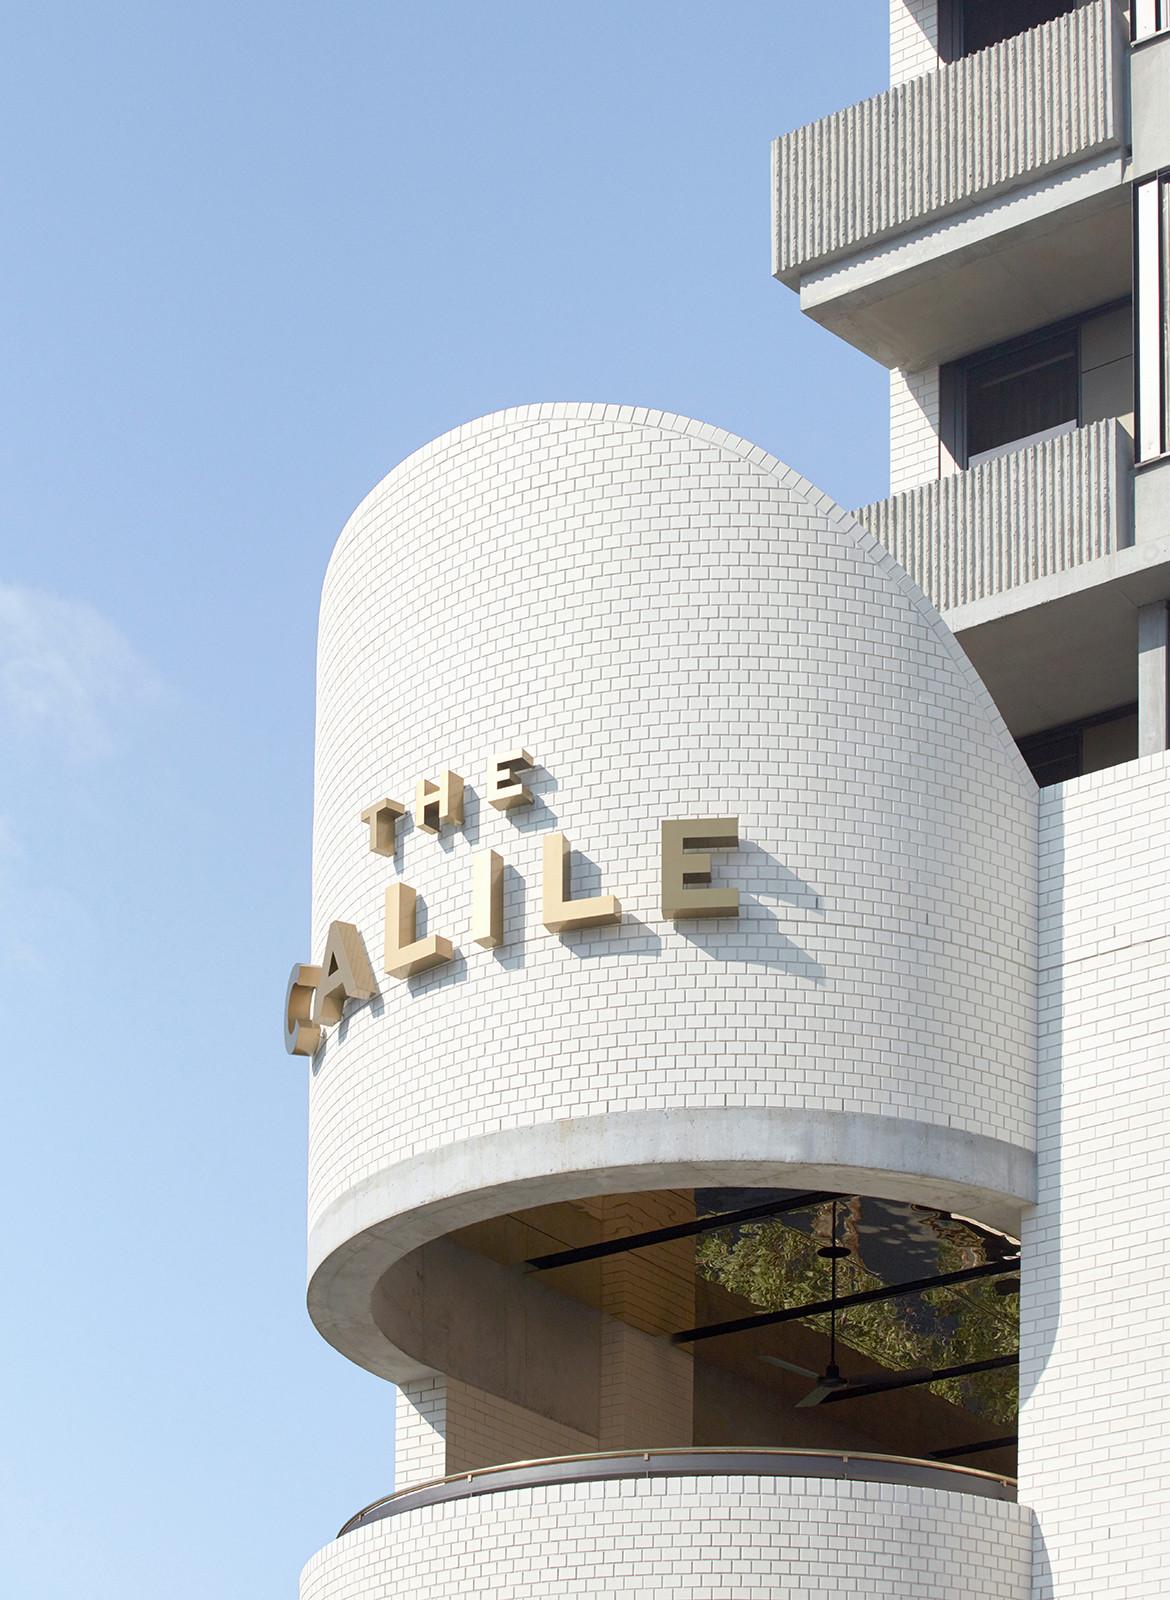 The Calile Hotel Richards & Spence CC Sean Fennessy design brickwork title wayfinding detail